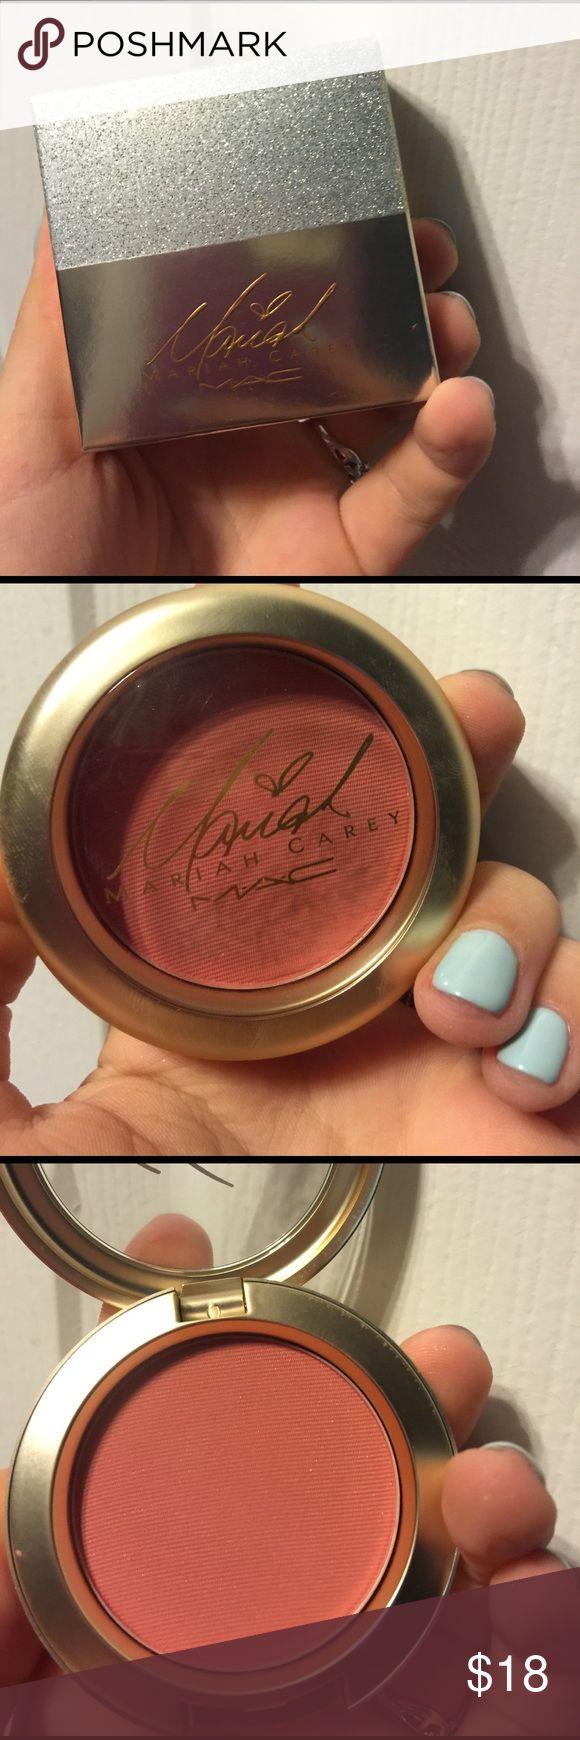 "Limited edition Mariah Carey Mac blush. Brand new blush. Shade name ""Sweet Sweet Fantasy"" MAC Cosmetics Makeup Blush"